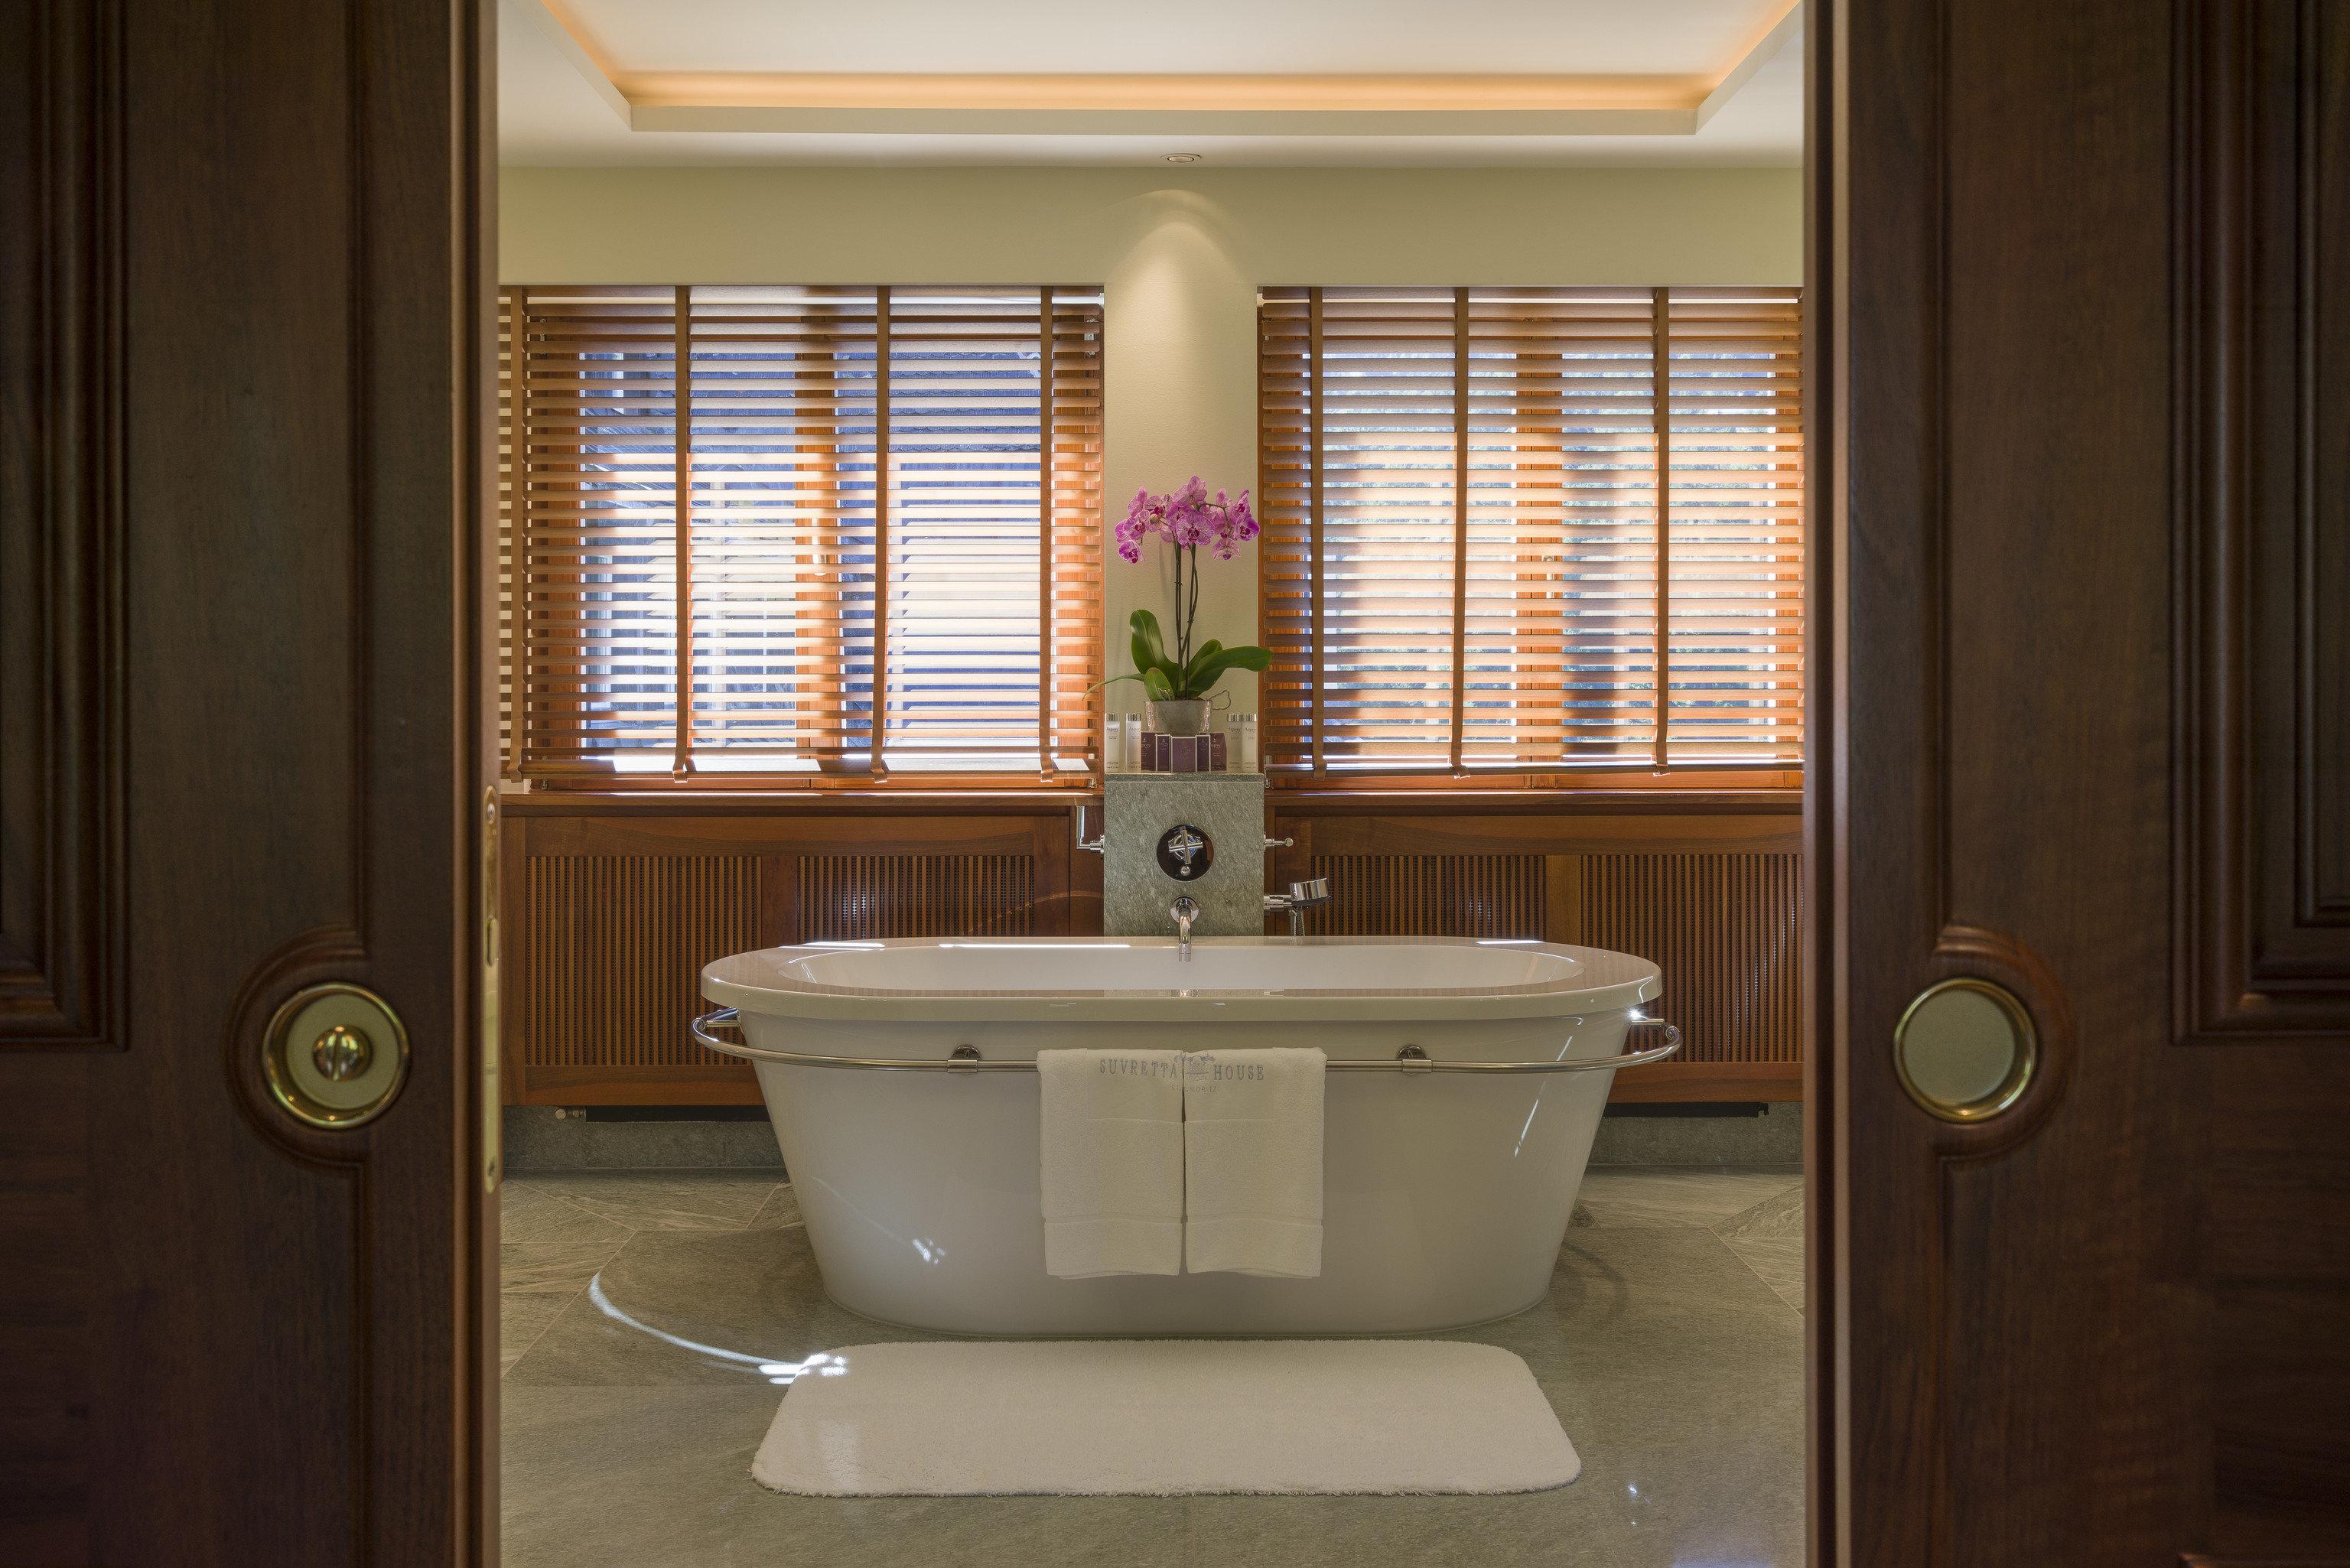 bathroom bathroom accessory window treatment plumbing fixture sink home window blind Bath